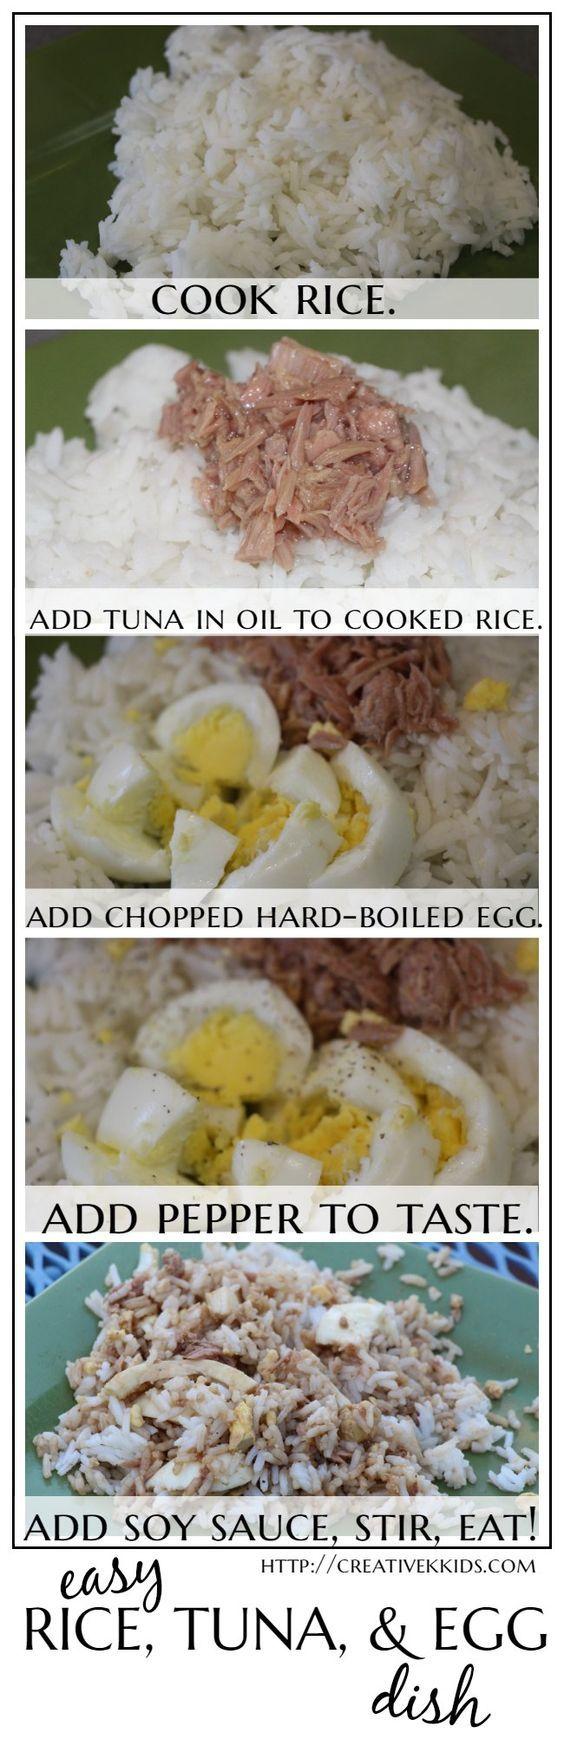 Tasty Tuesdays: Easy Rice, Tuna Fish, And Egg Dish